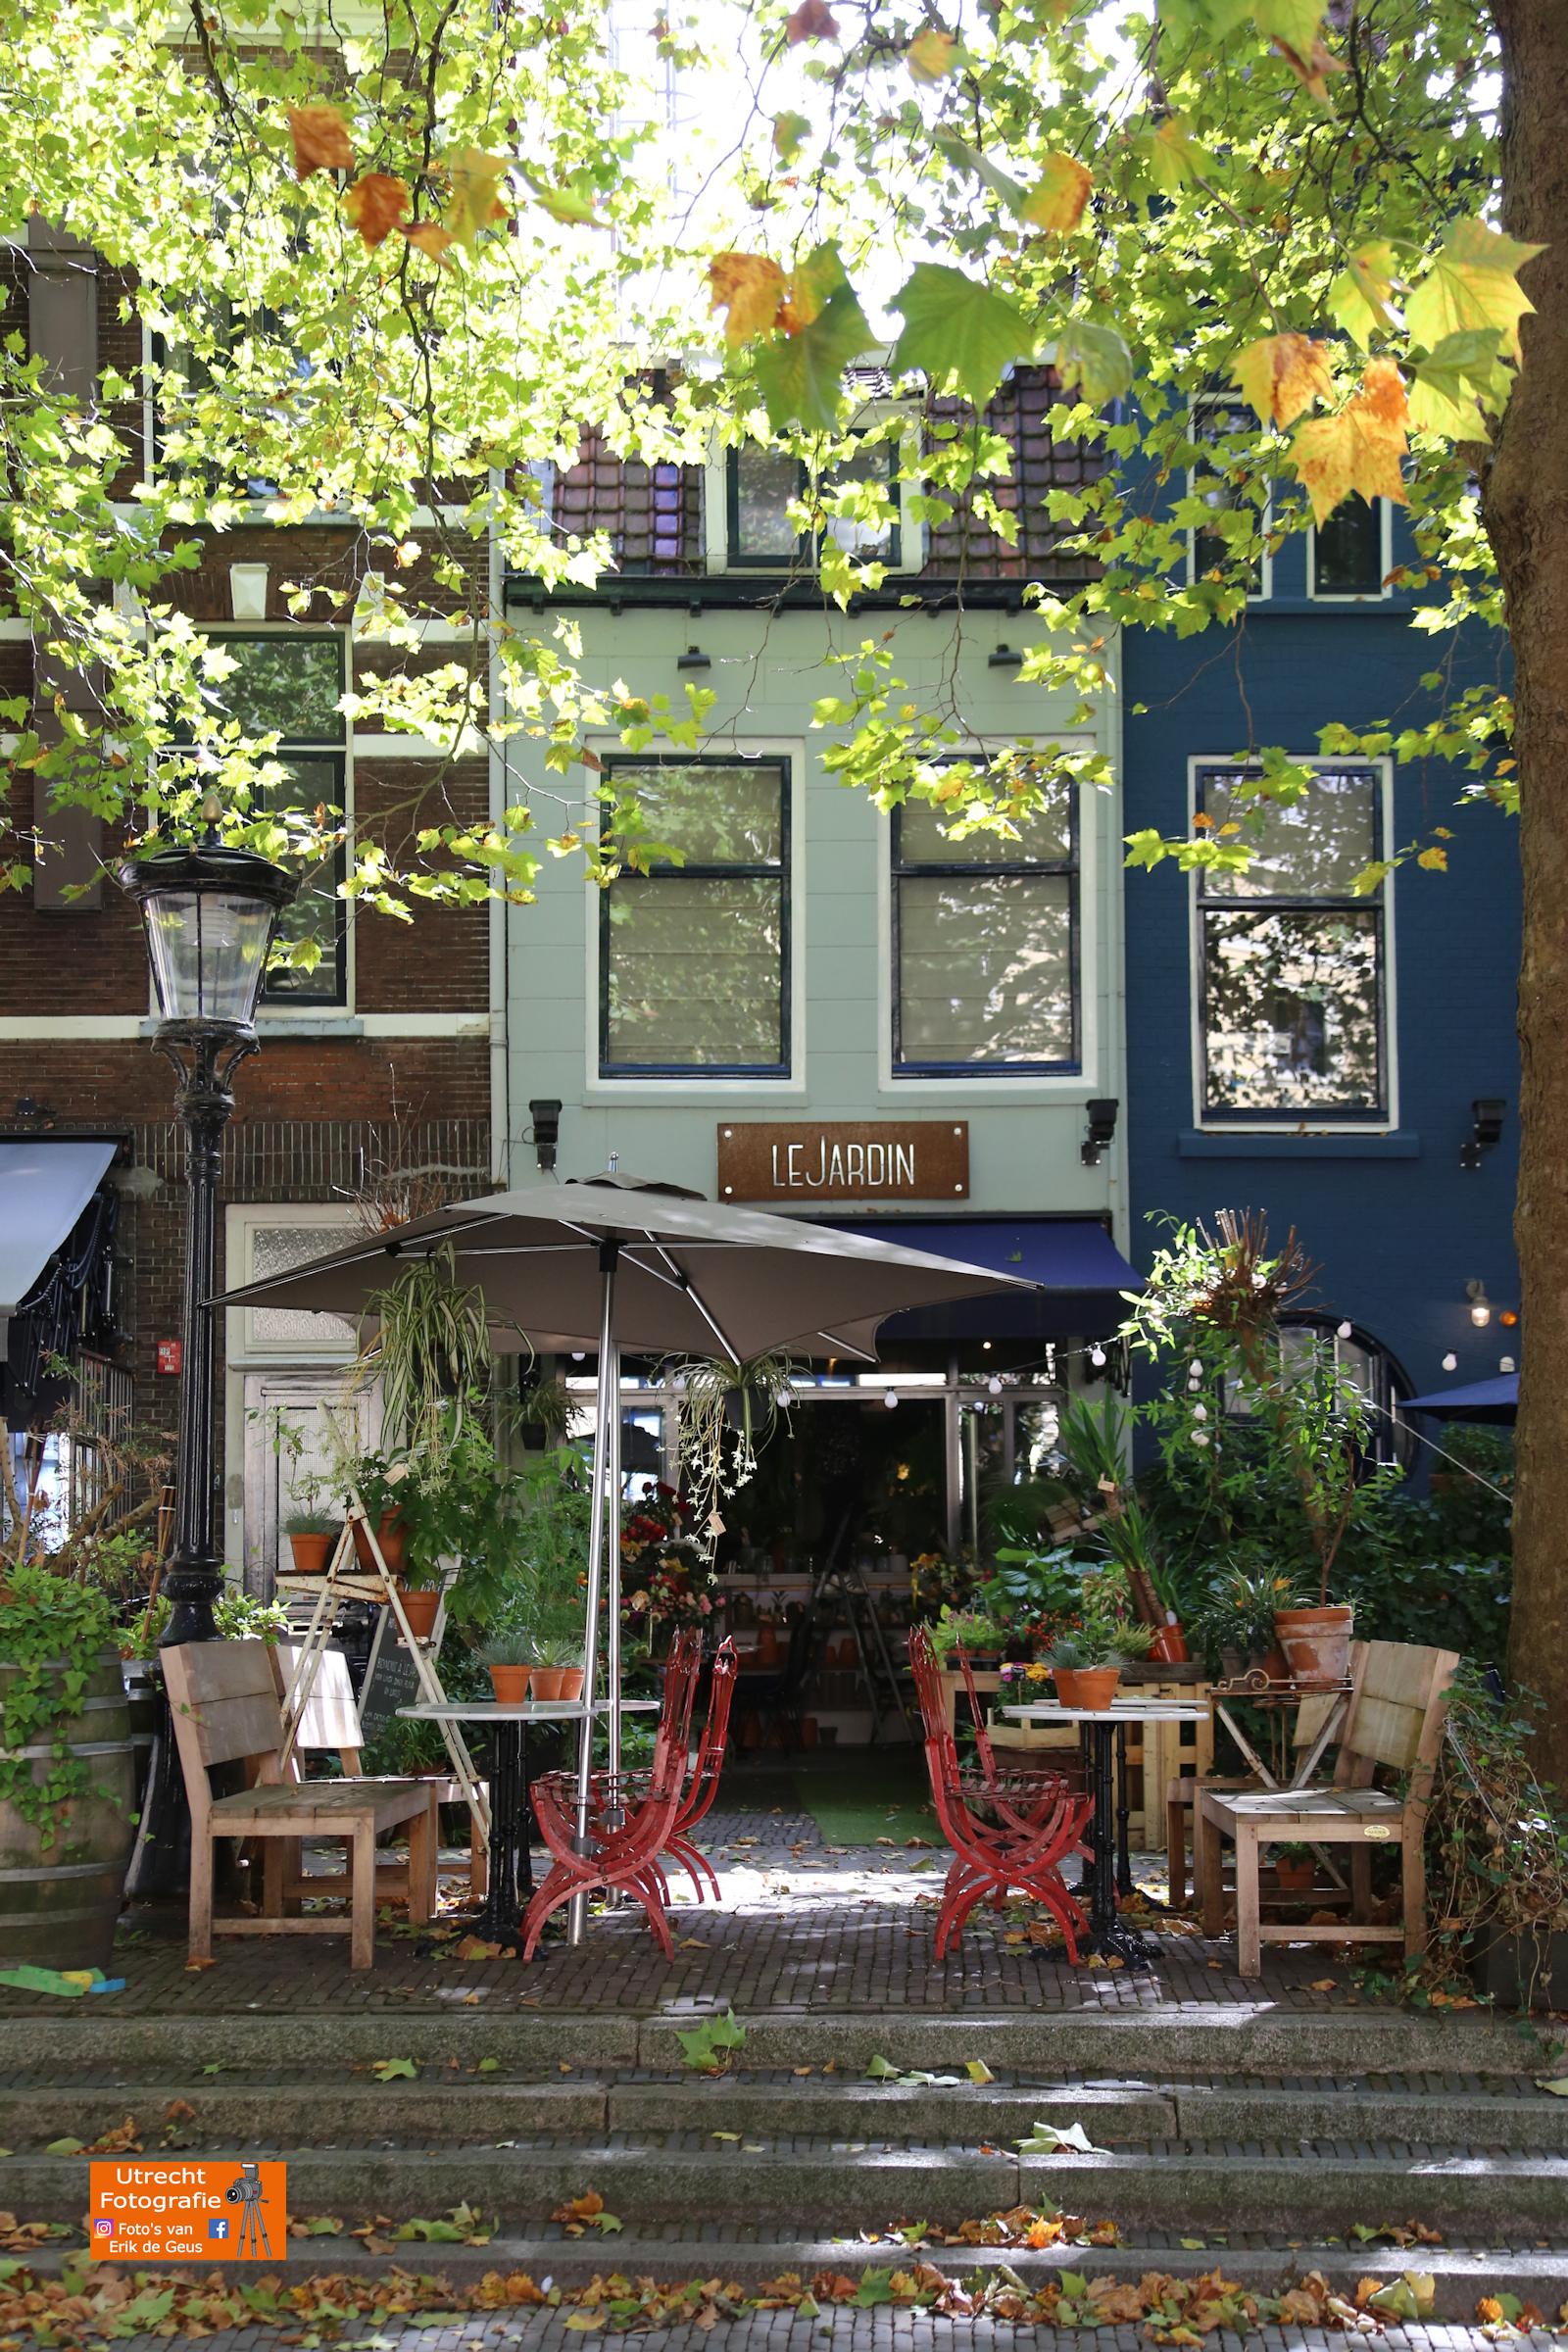 20180921 Mariaplaats (Le Jardin) 01